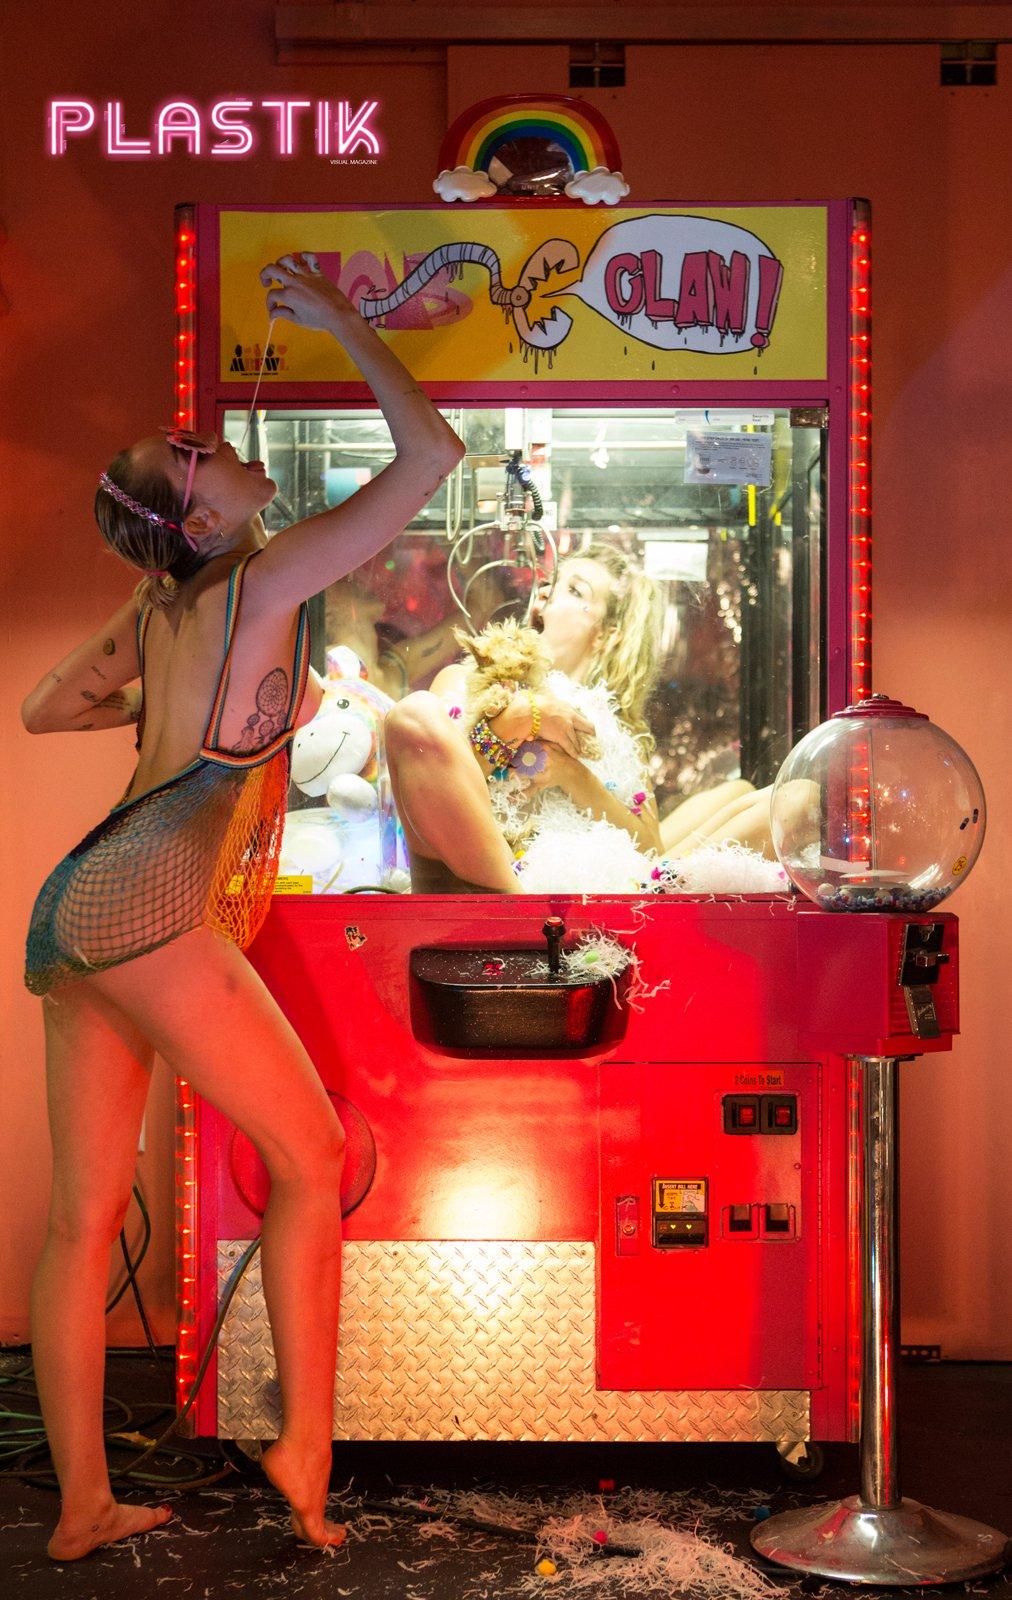 Miley Cyrus - Plastik